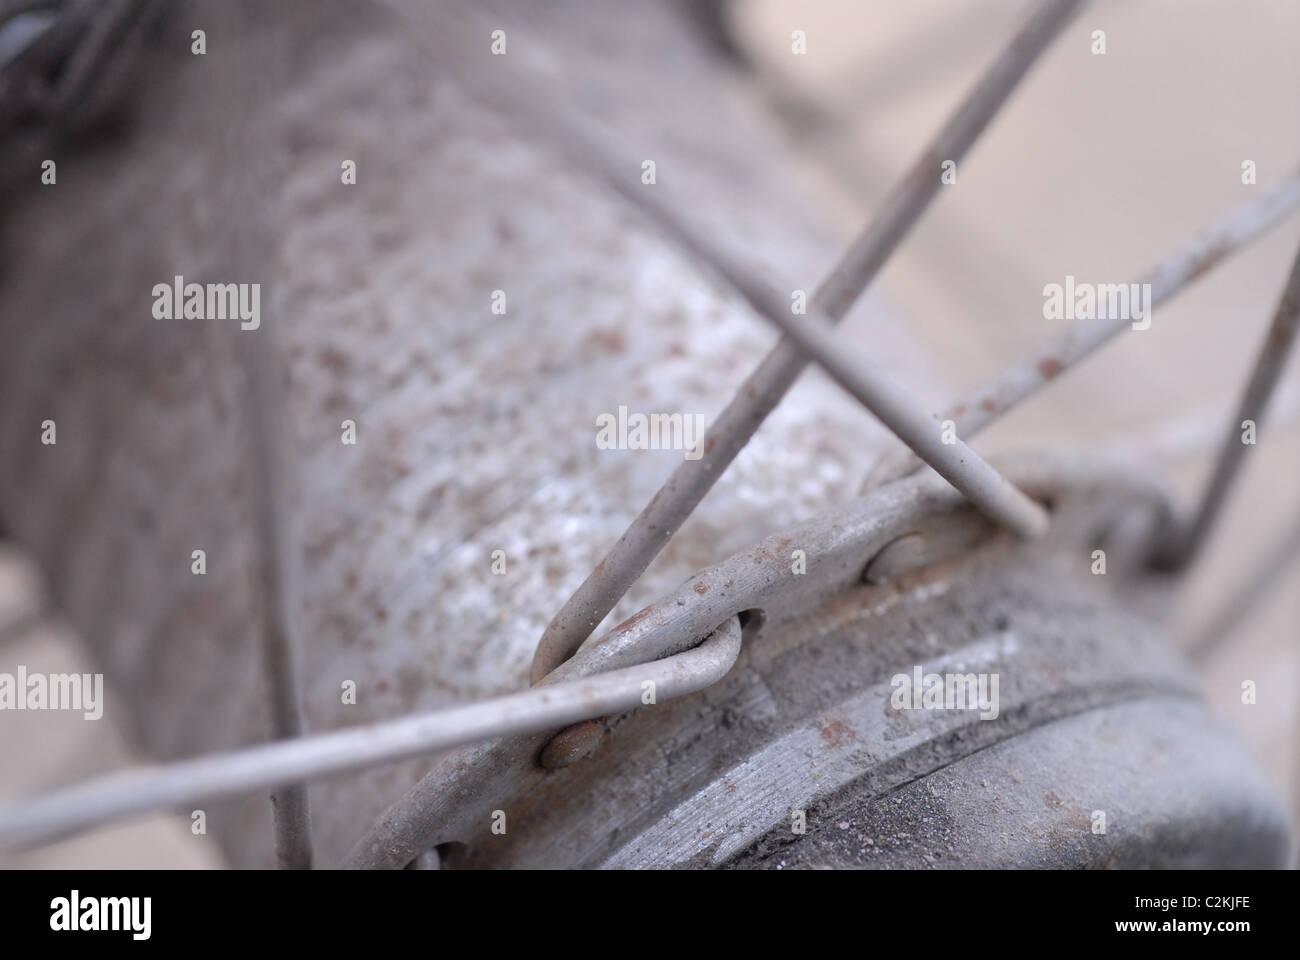 Bicycle hub. - Stock Image